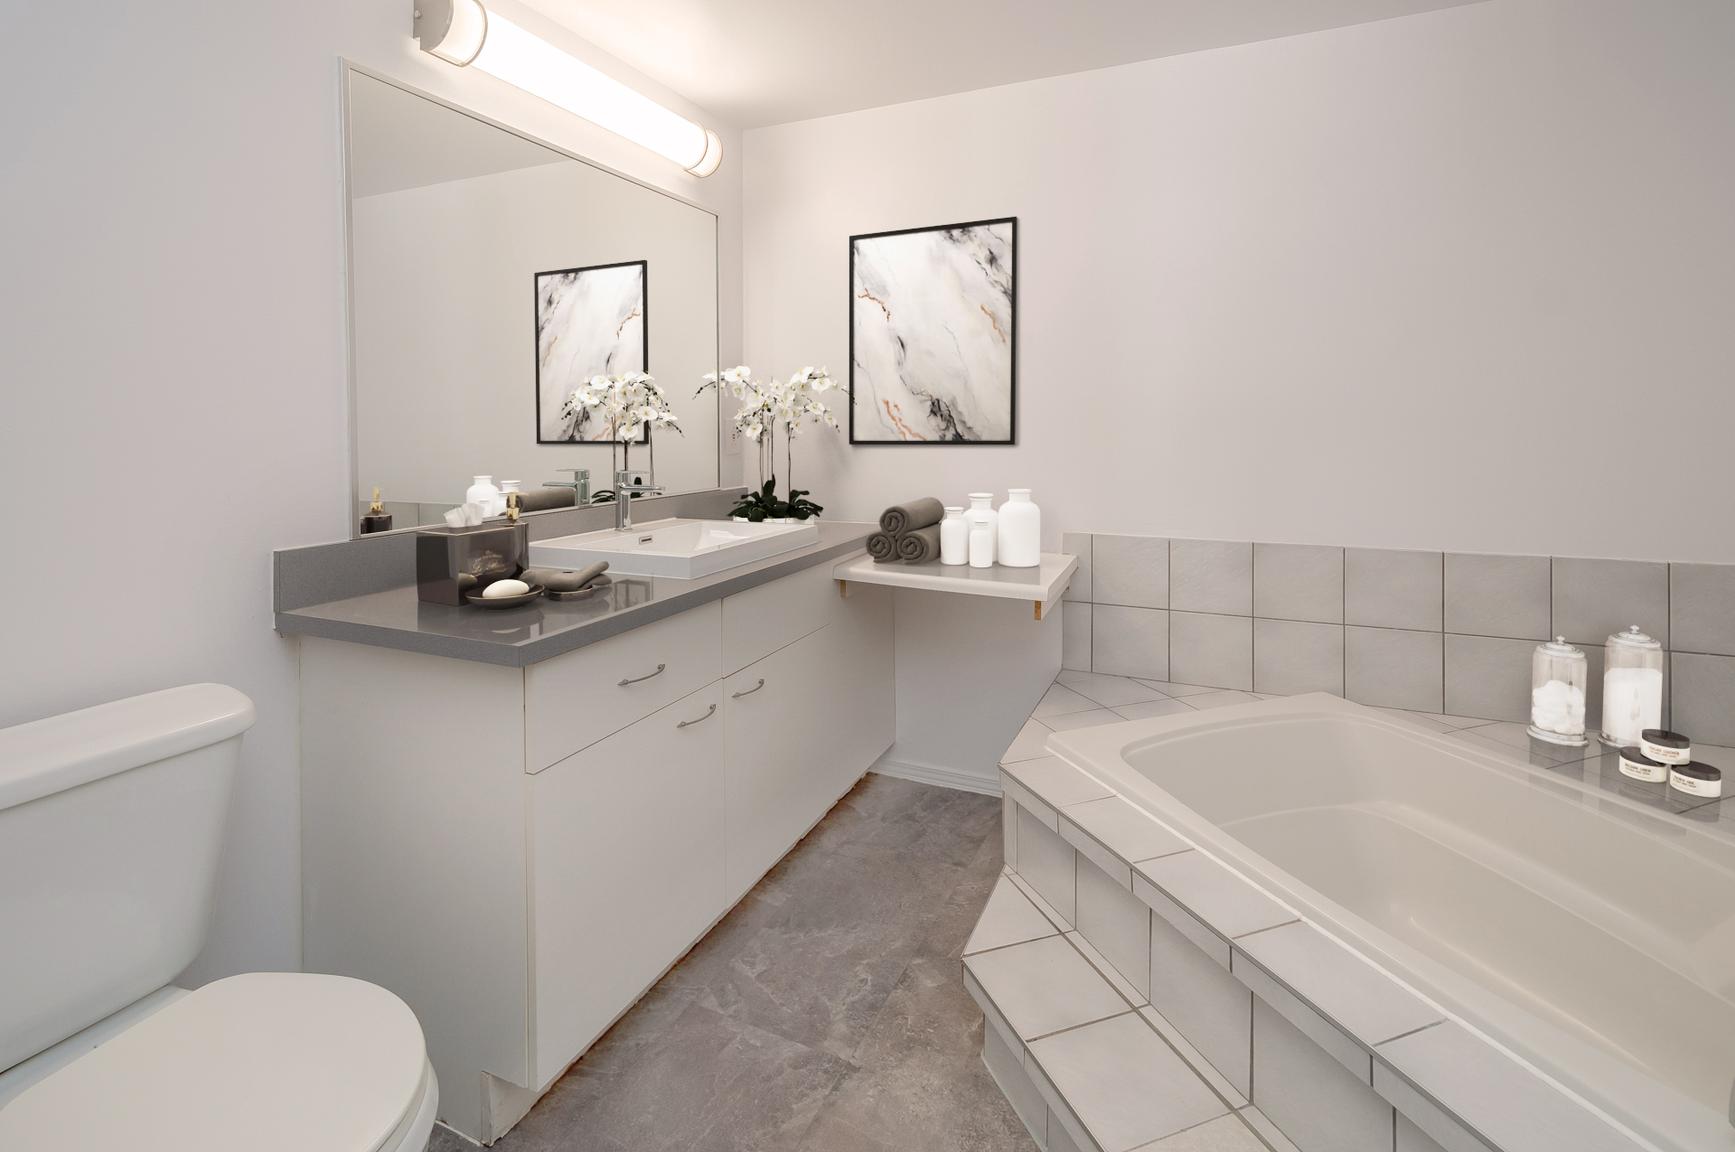 2 bedroom Apartments for rent in Quebec City at Les Appartements du Verdier - Photo 22 - RentQuebecApartments – L407124